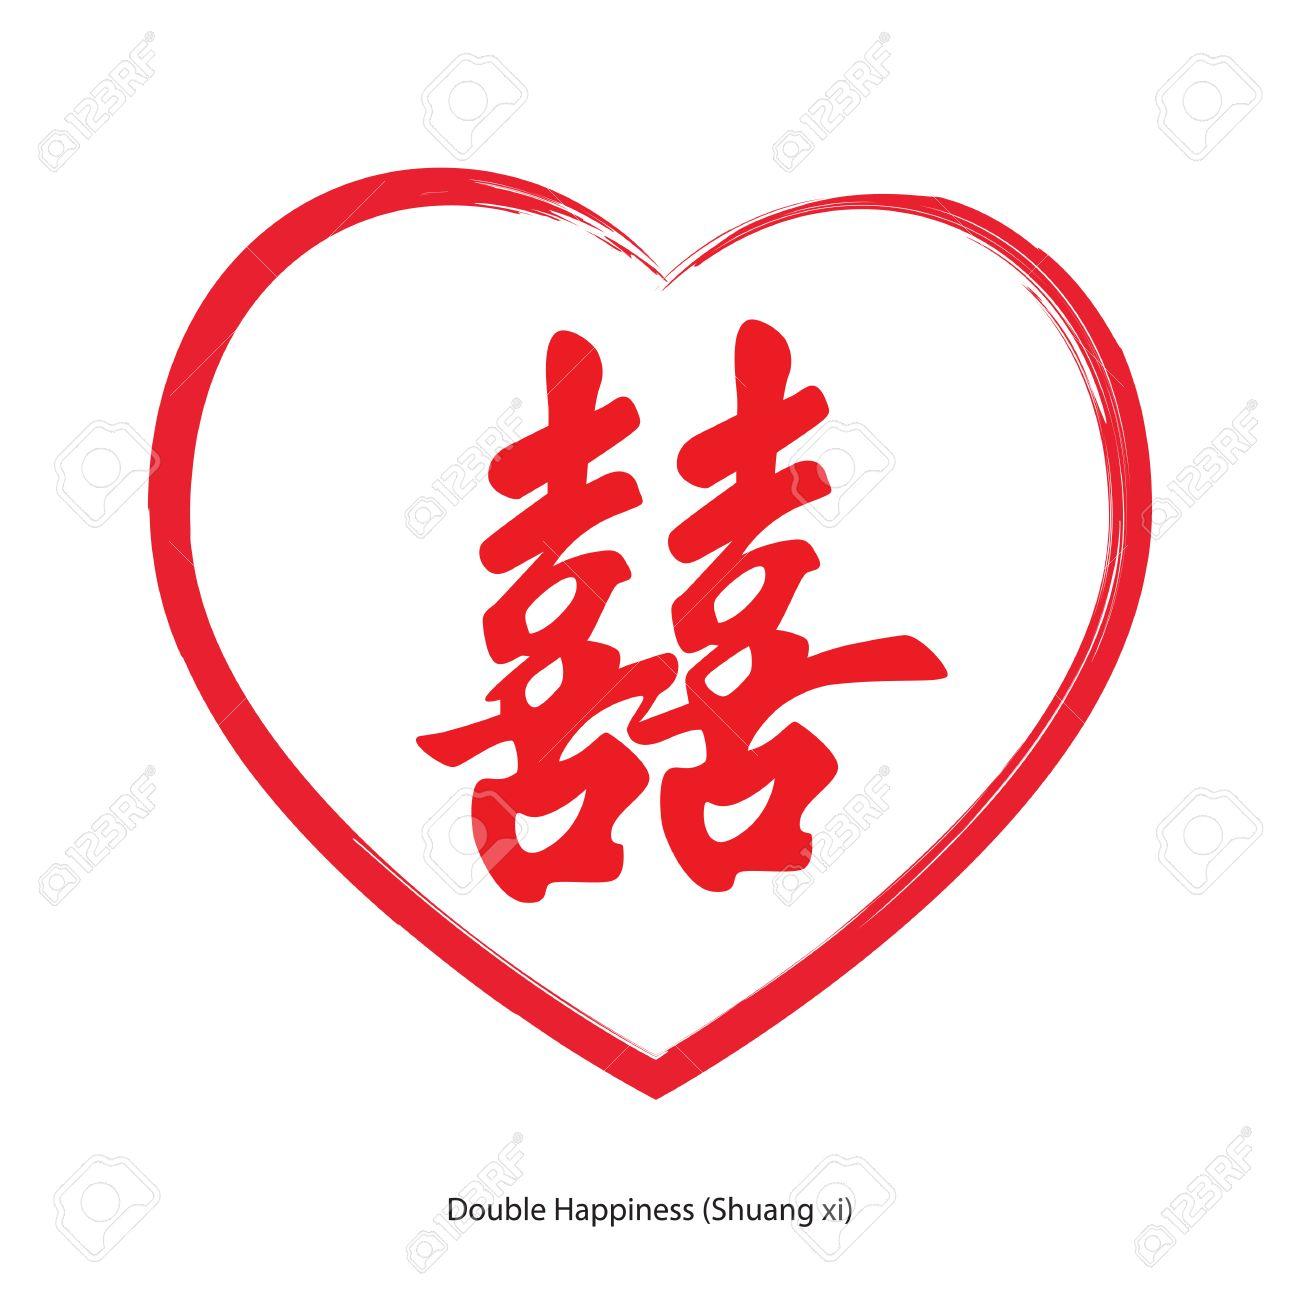 Bien connu Hinese Caractère Double Bonheur Avec Coeur. Shuang Xi, Chinois  CN57